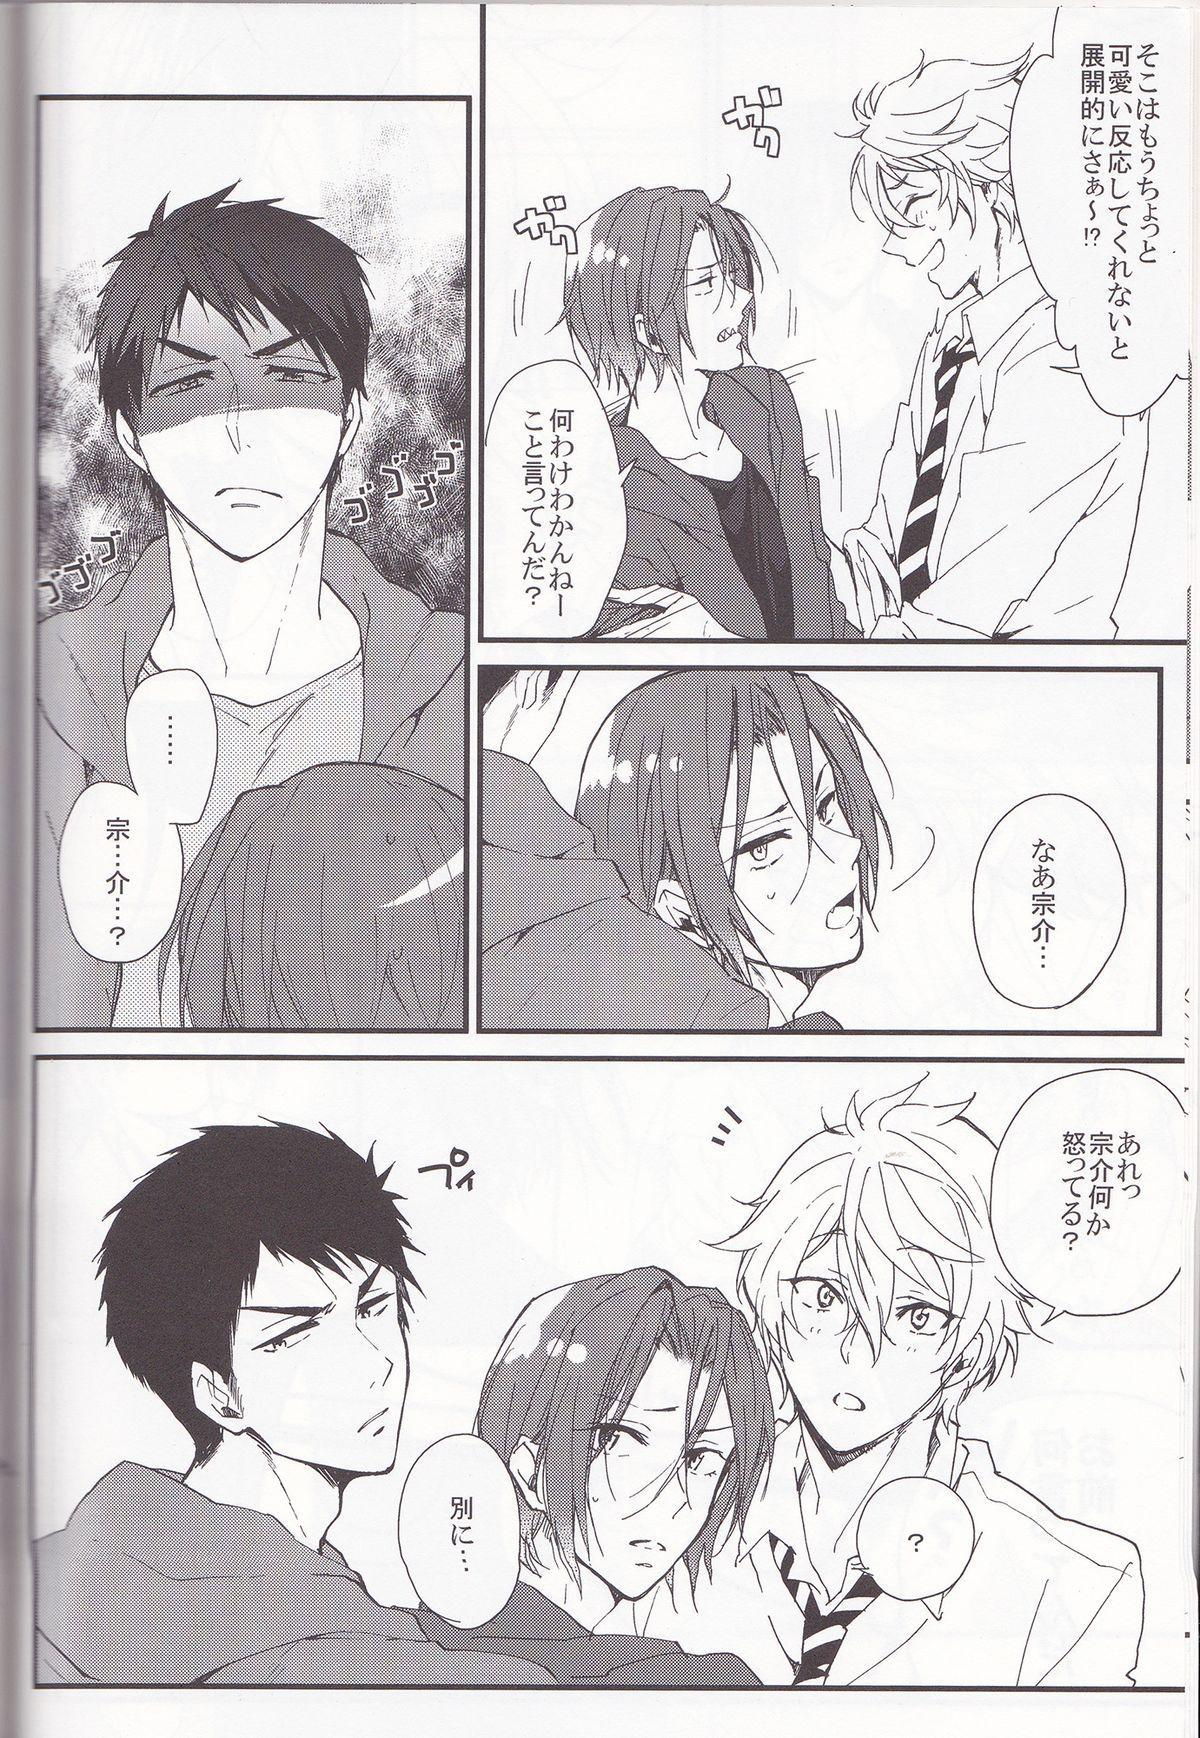 Sano-san! 4